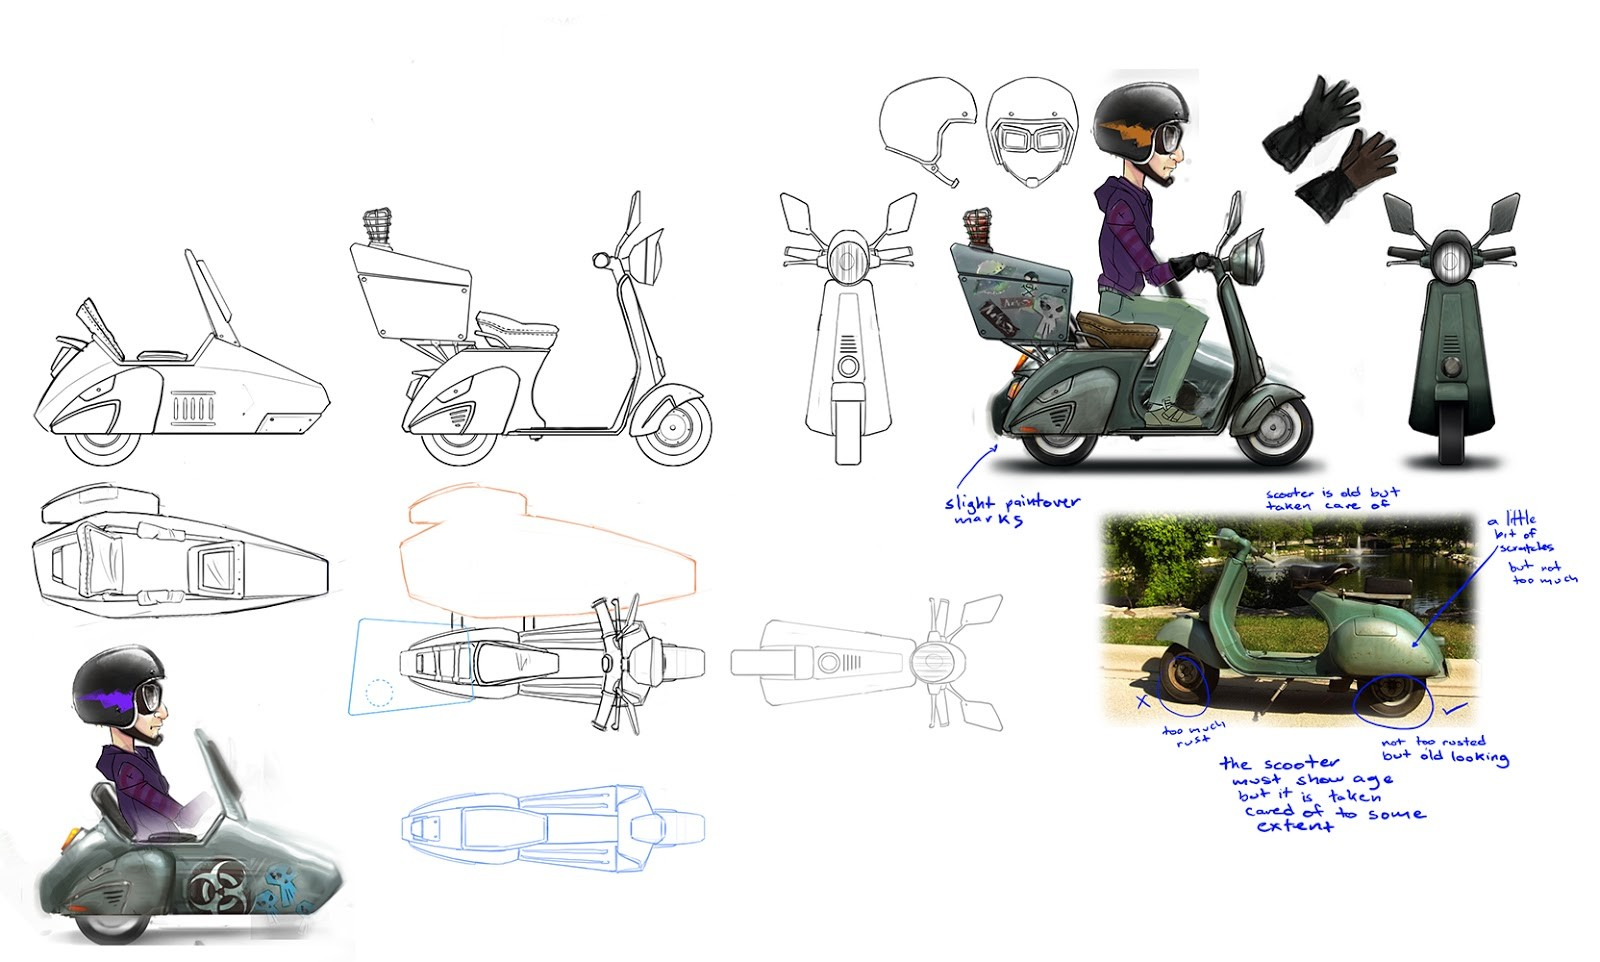 Jose cua scooter model sheet 02